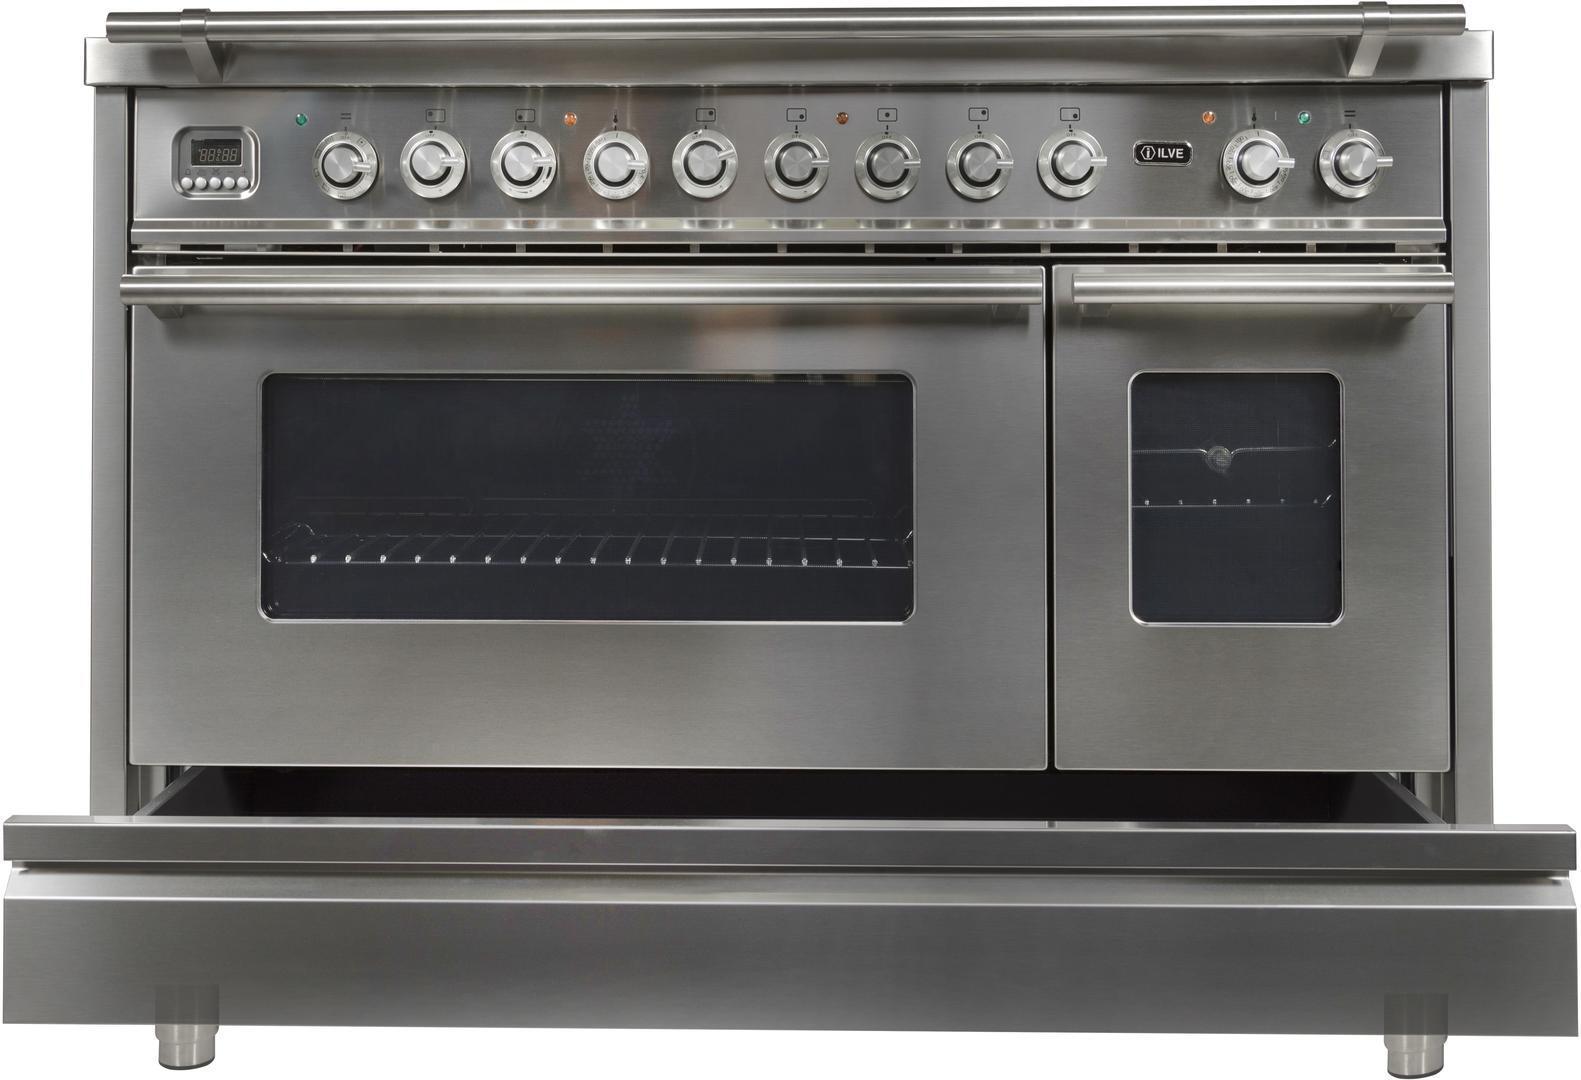 Ilve Professional Plus UPW120FDMPI Freestanding Dual Fuel Range Stainless Steel, Dishwarming Drawer